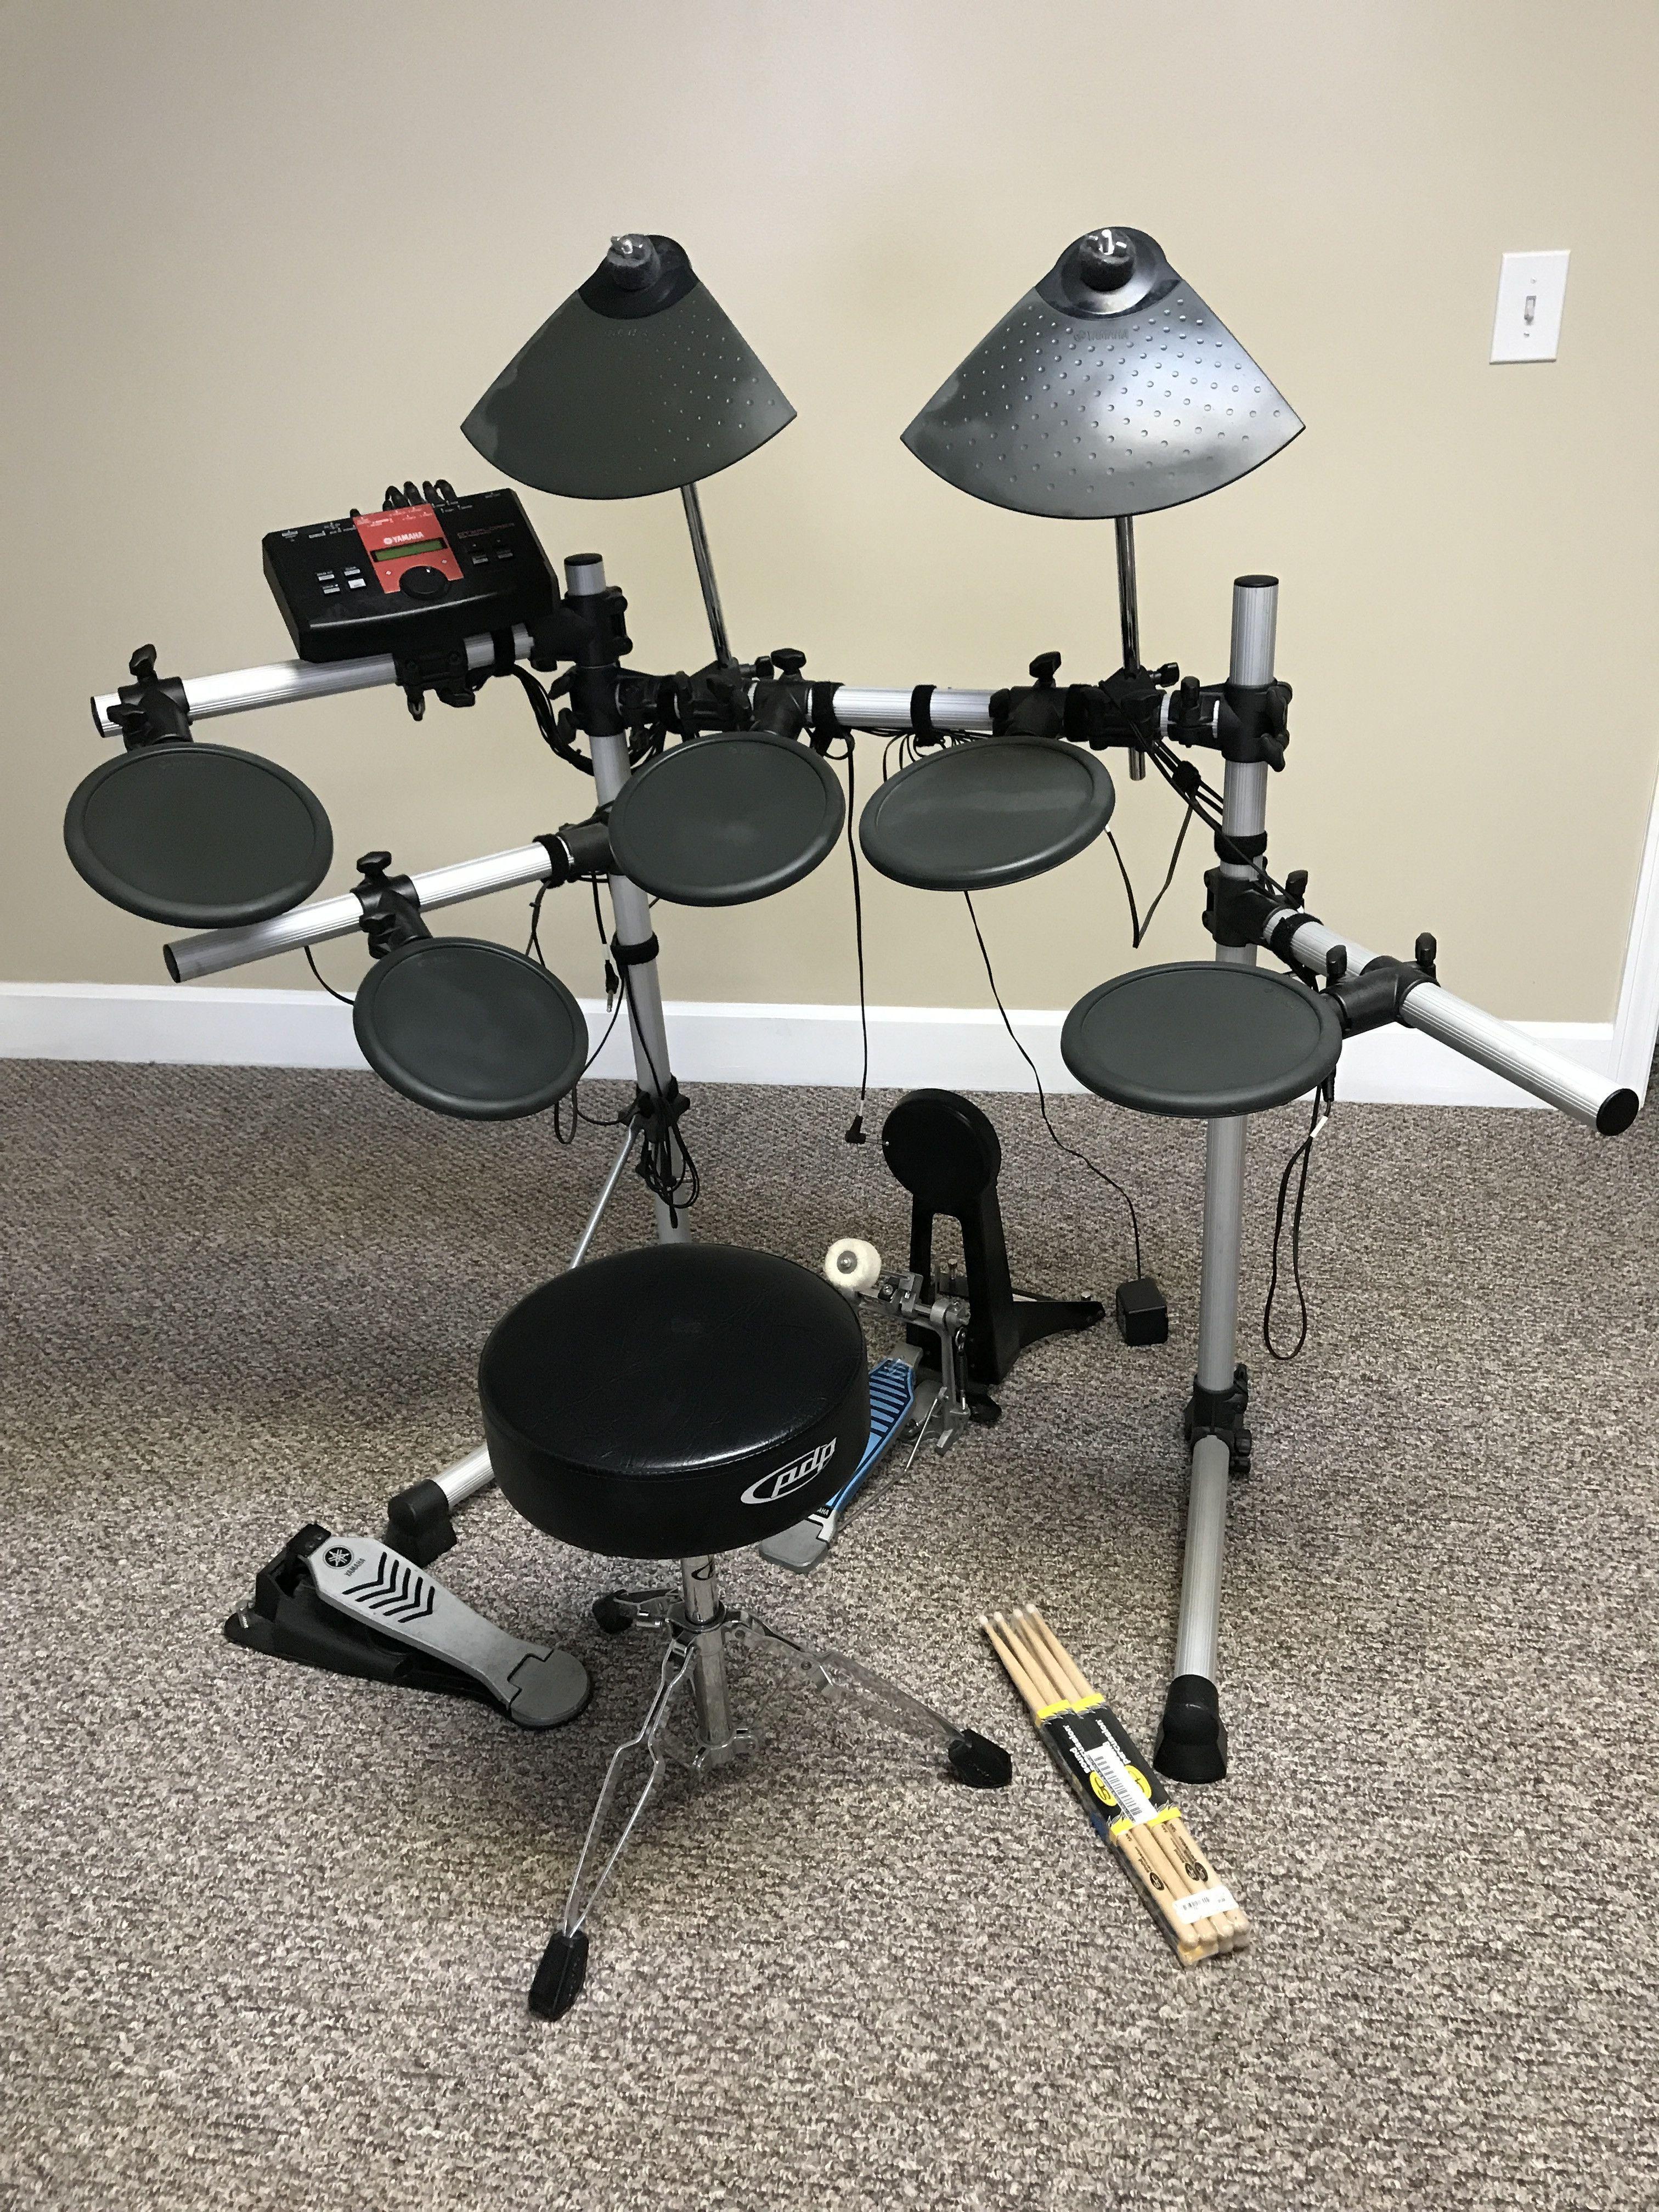 yamaha dtxplorer electronic drum set products pinterest drum rh pinterest ch Yamaha DTXplorer Accessories Yamaha Explorer Electronic Drums